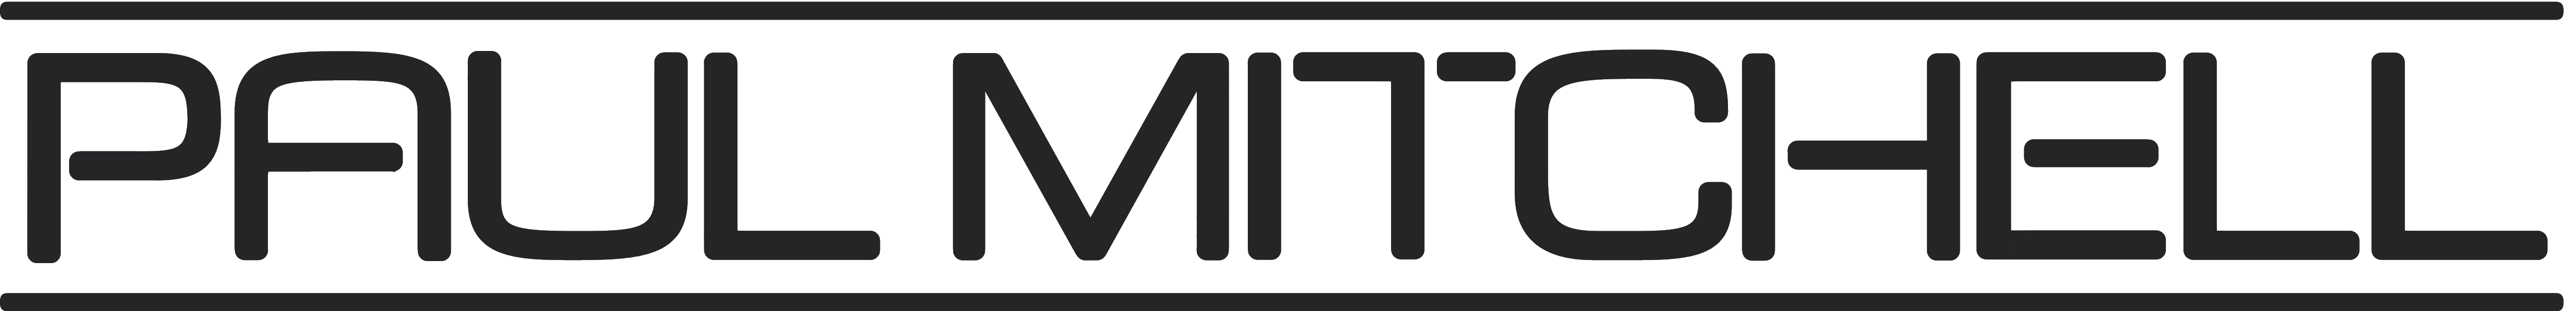 Paul Mitchell Logo